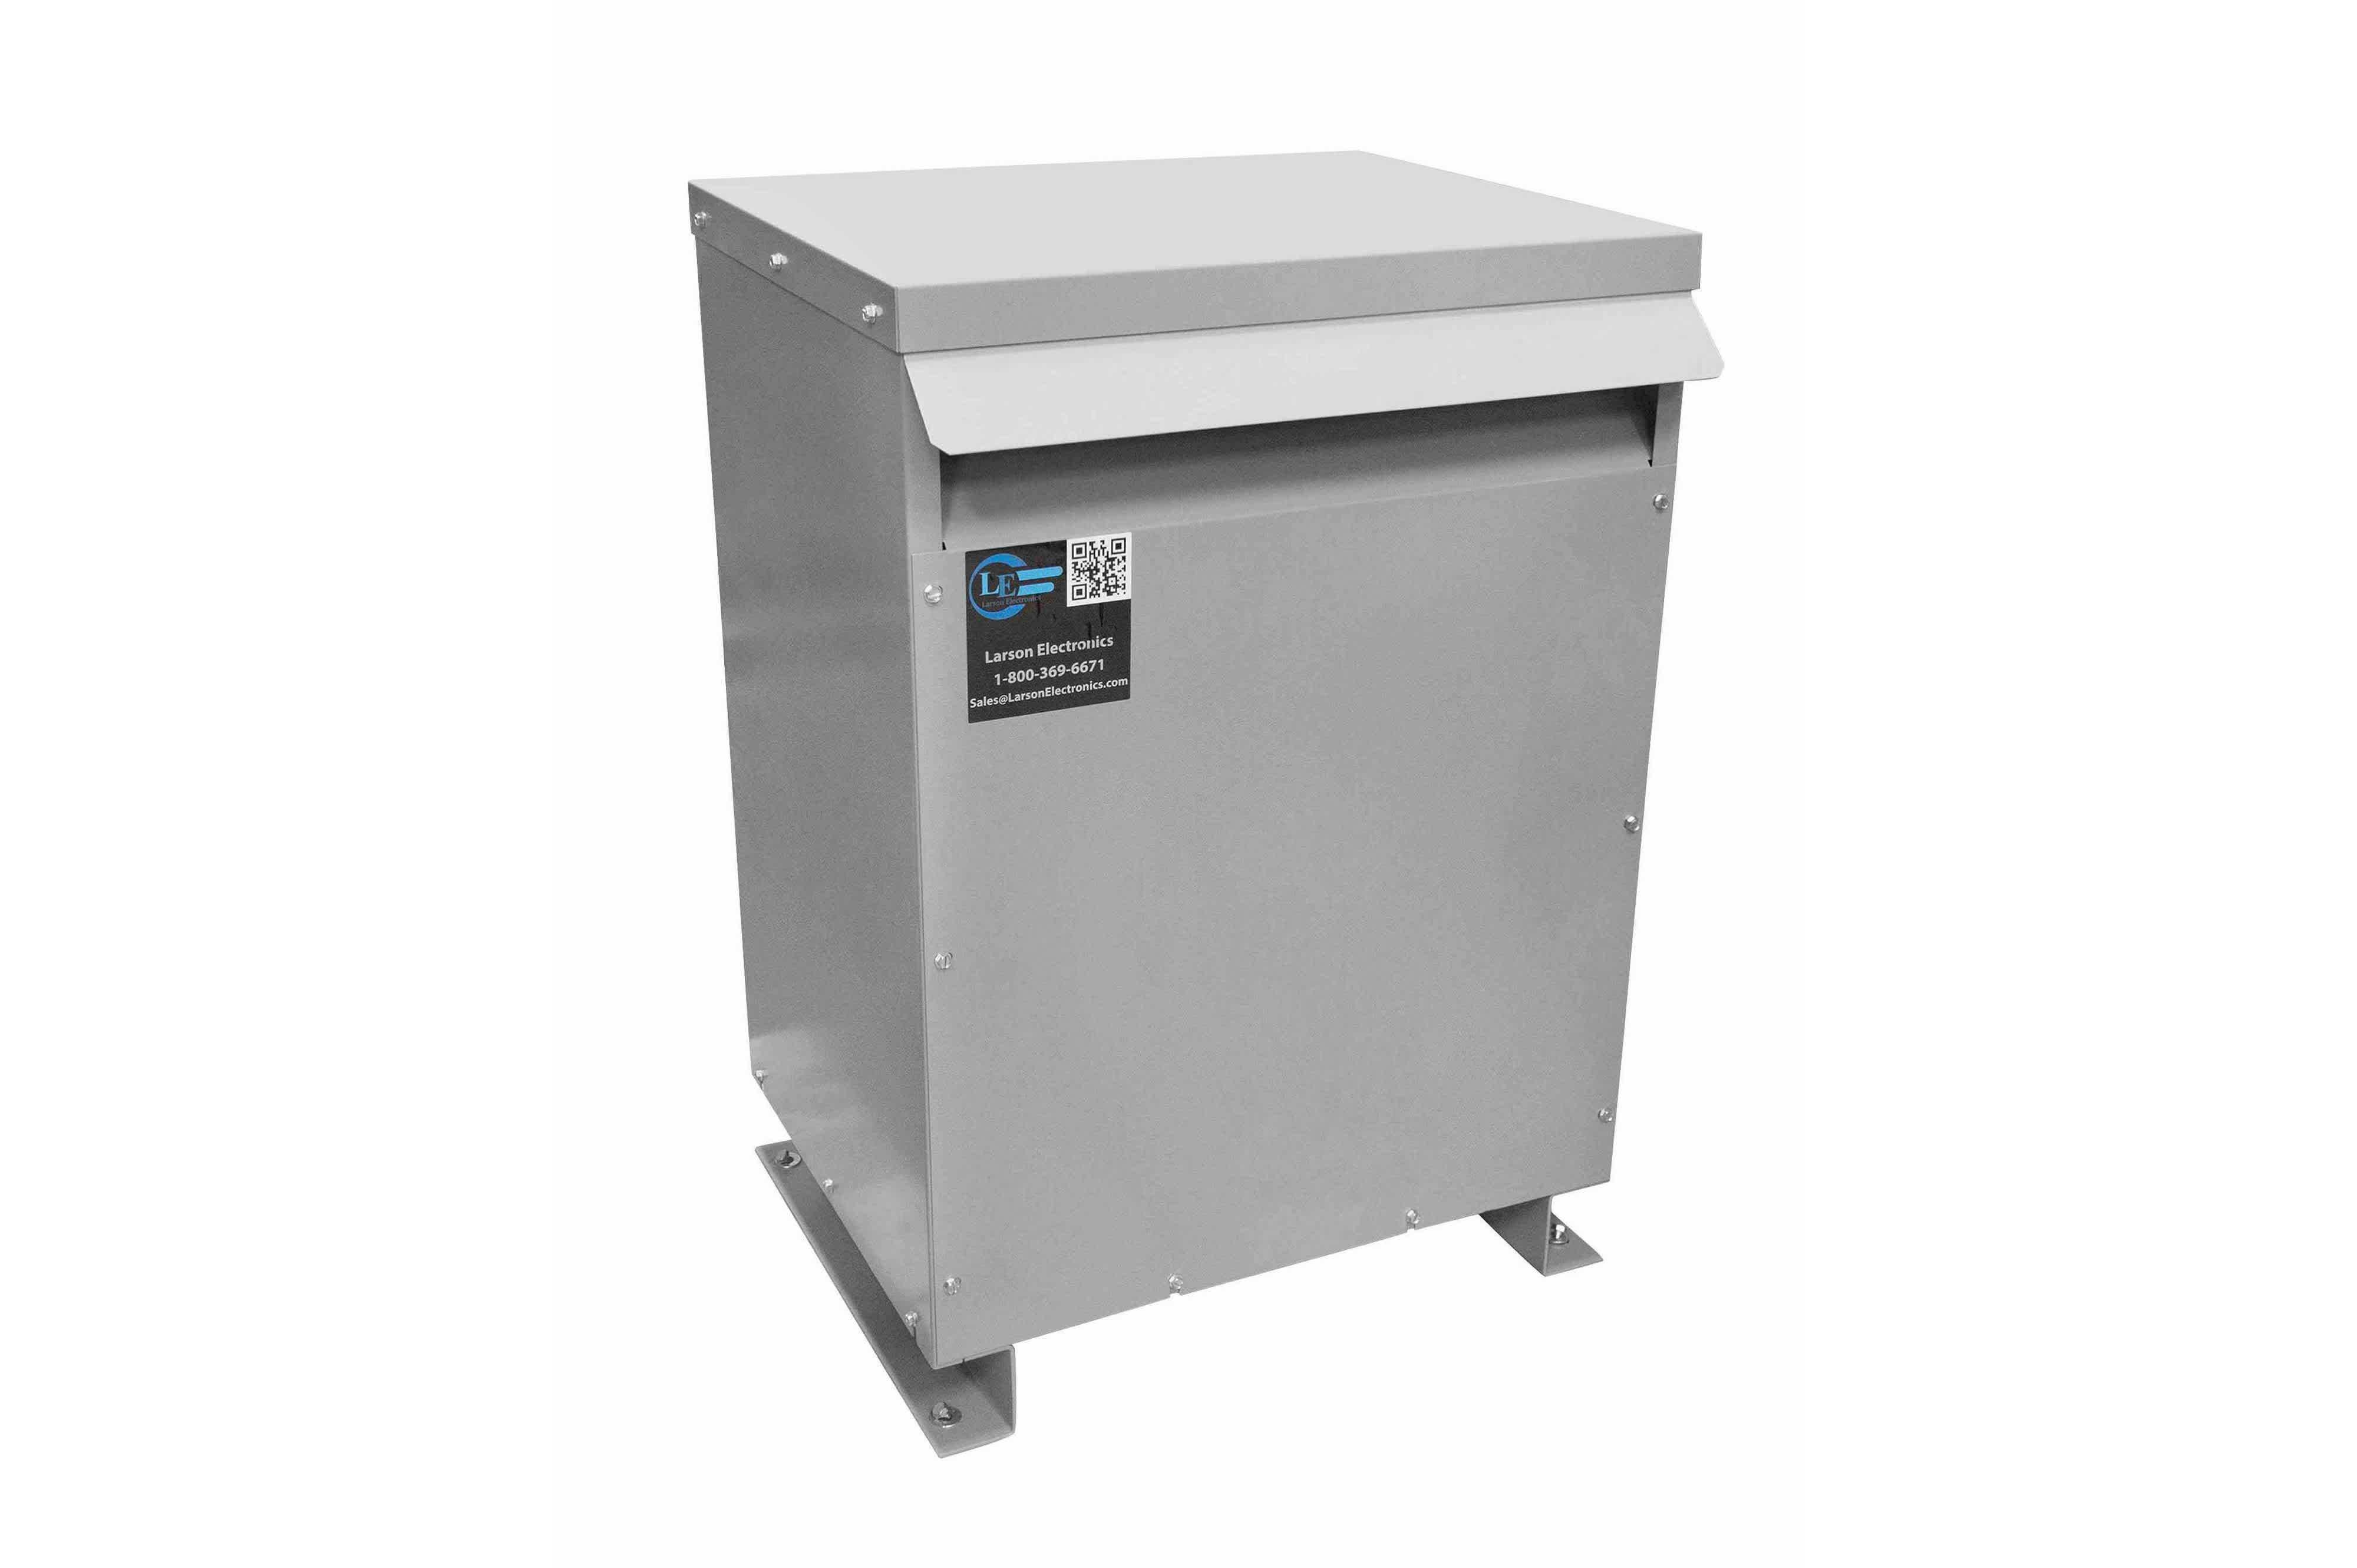 9 kVA 3PH Isolation Transformer, 440V Wye Primary, 208V Delta Secondary, N3R, Ventilated, 60 Hz